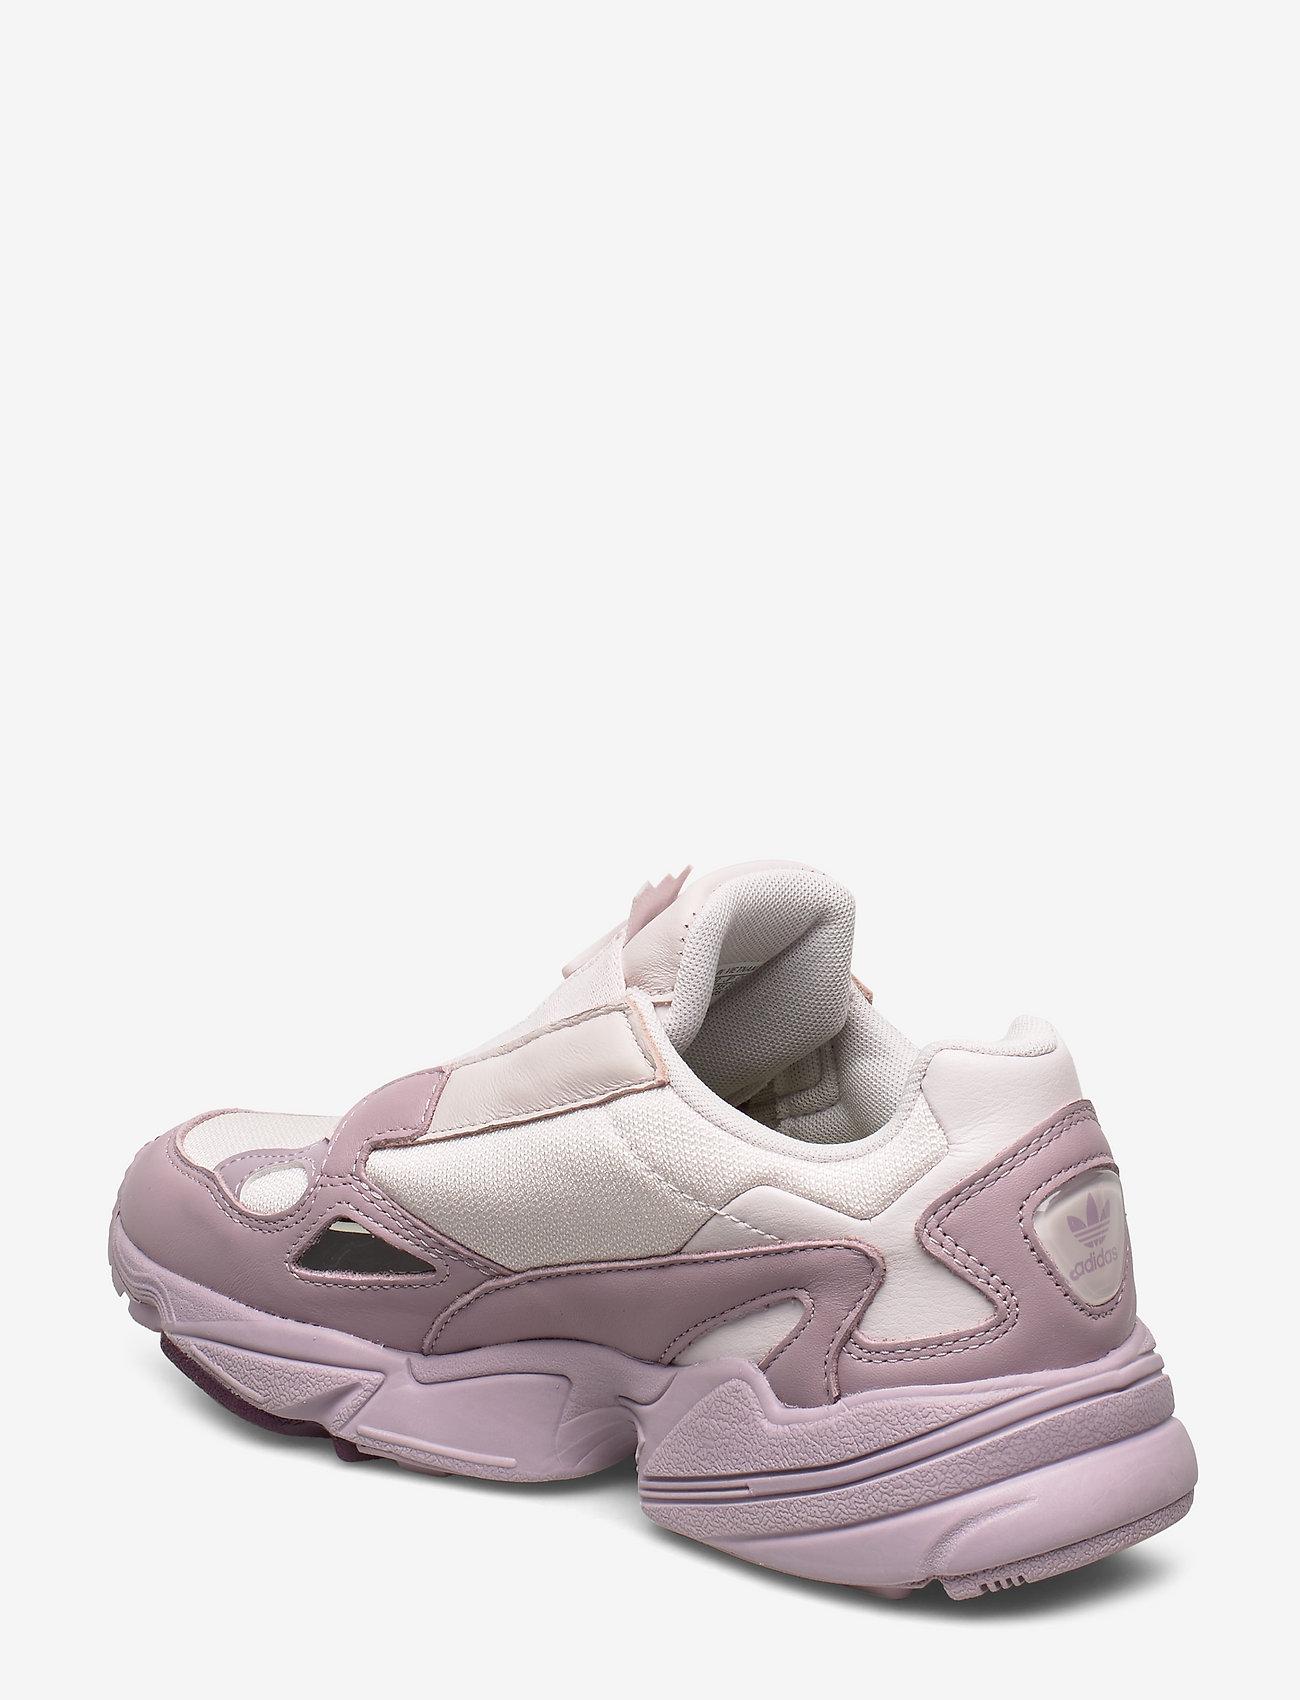 Falcon Zip W (Orctin/sofvis/purbea) - adidas Originals